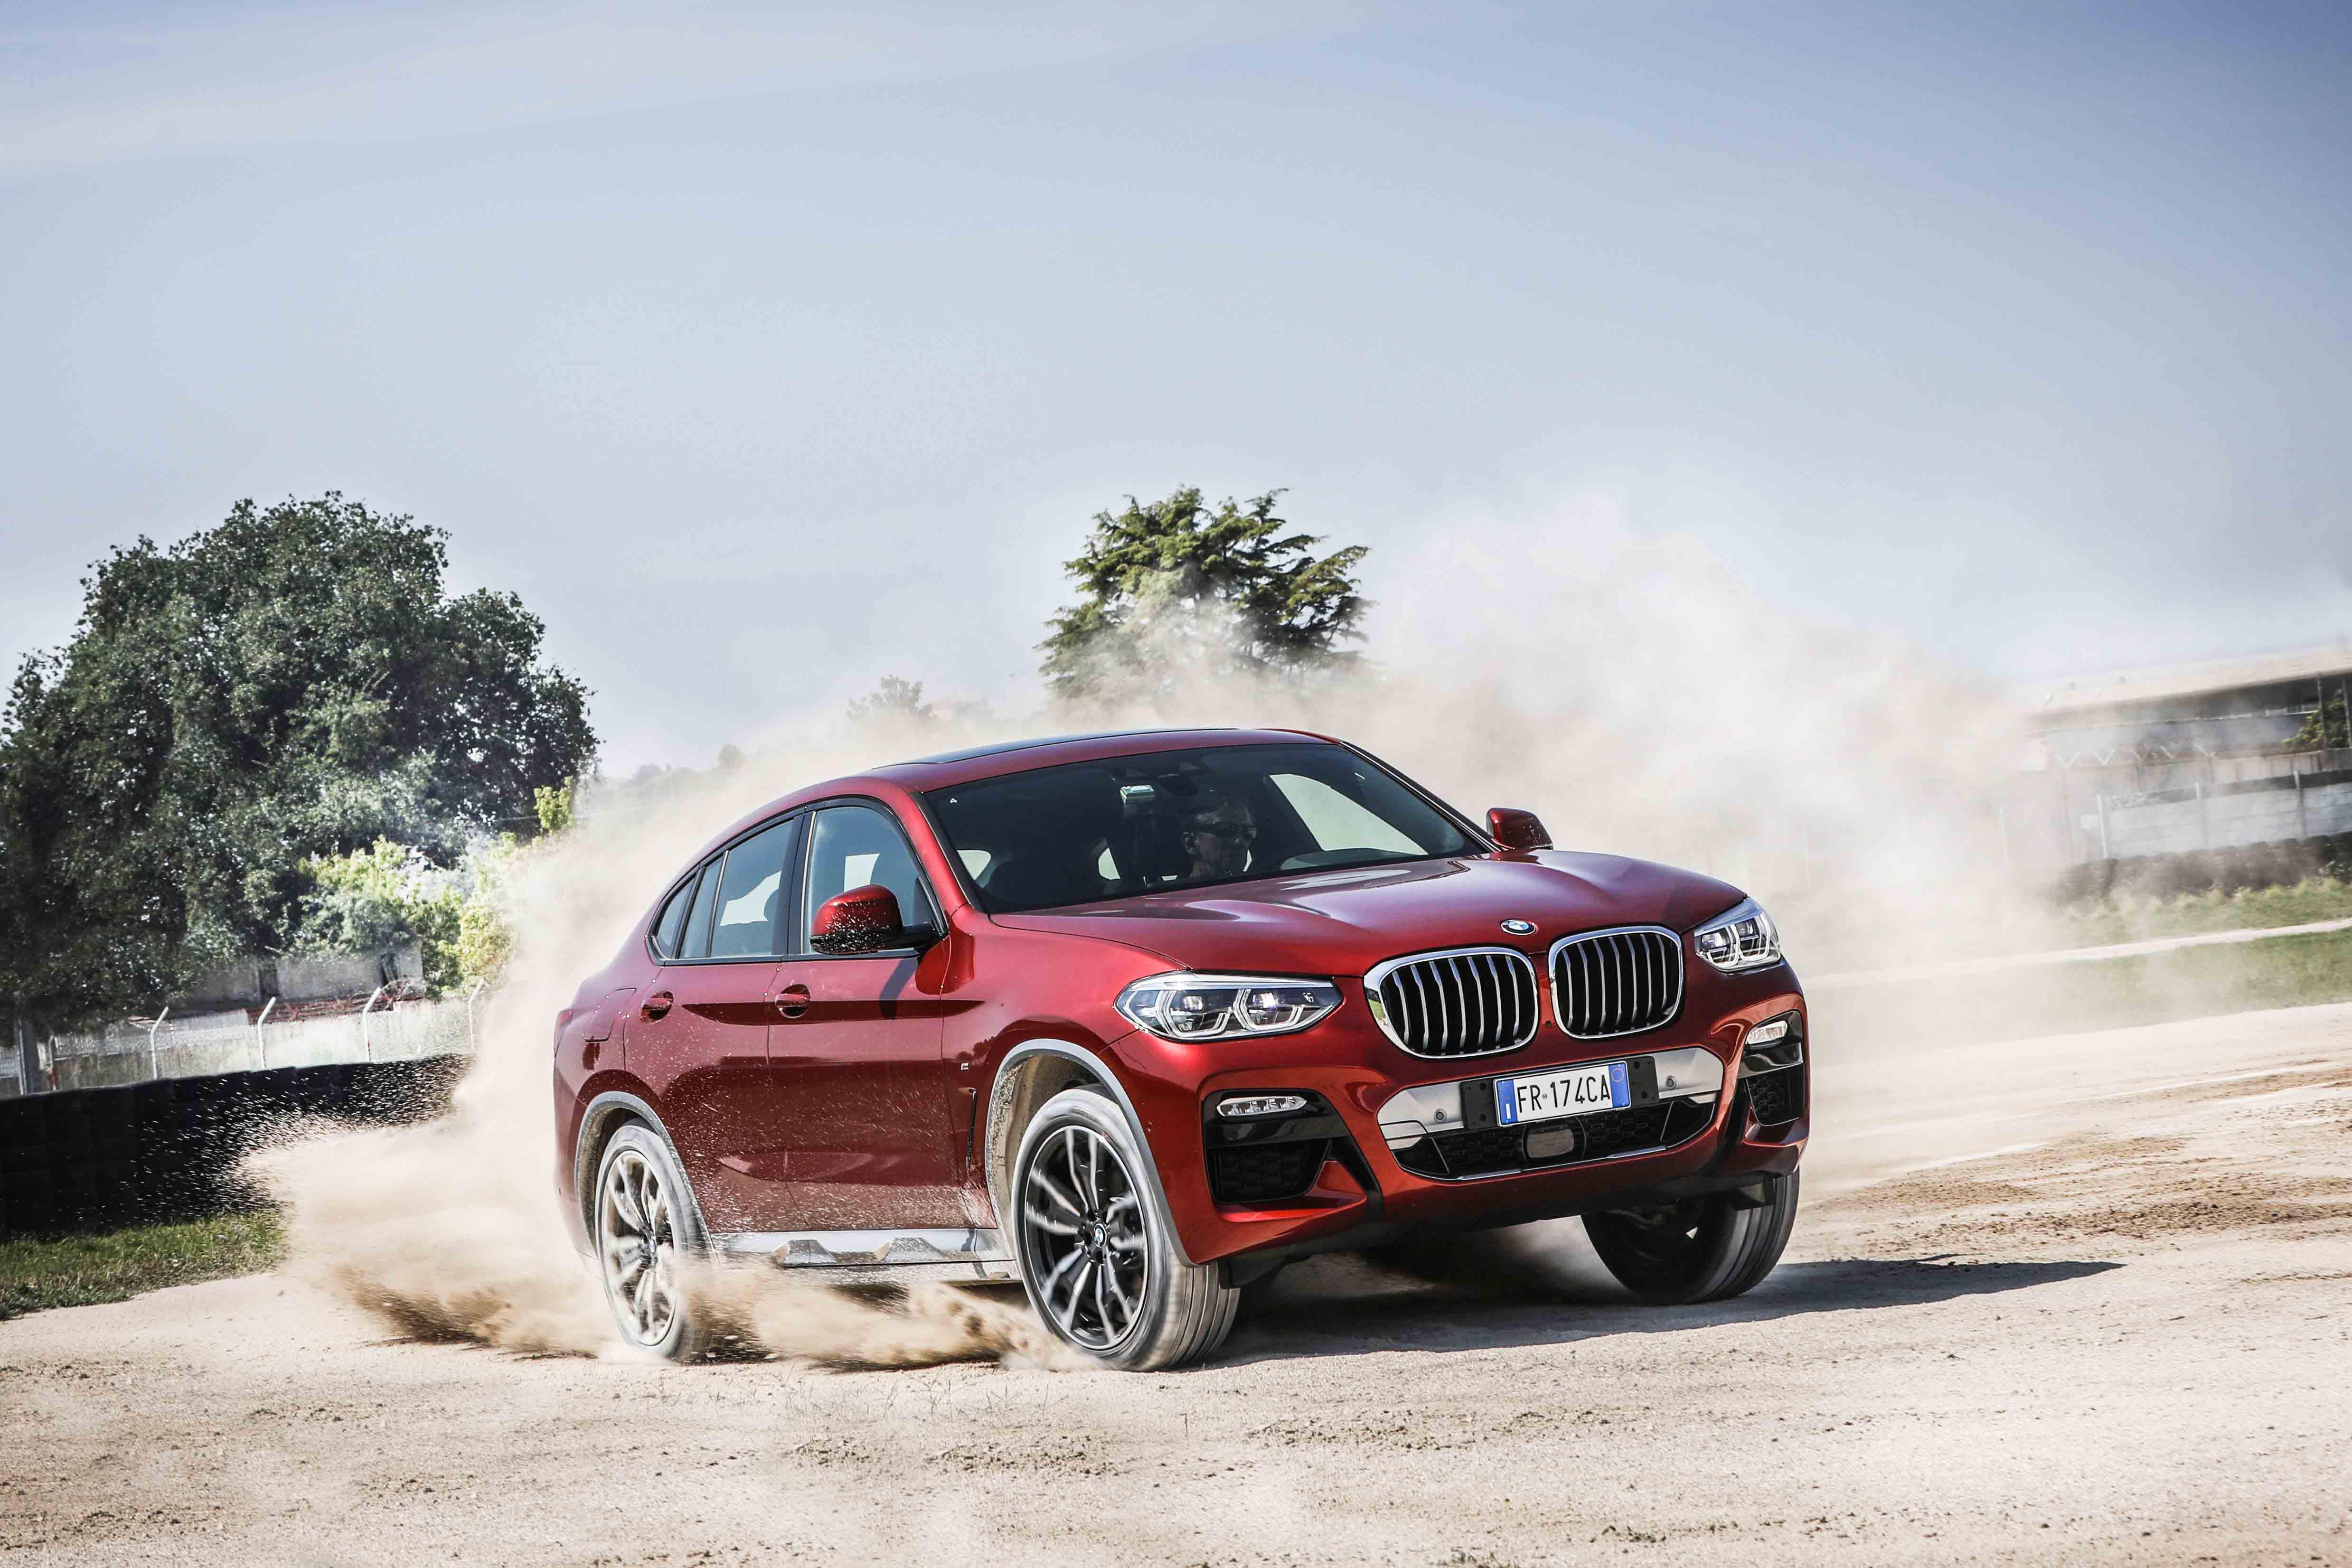 Nuova BMW X4: la grintosa tedesca domina la categoria thumbnail